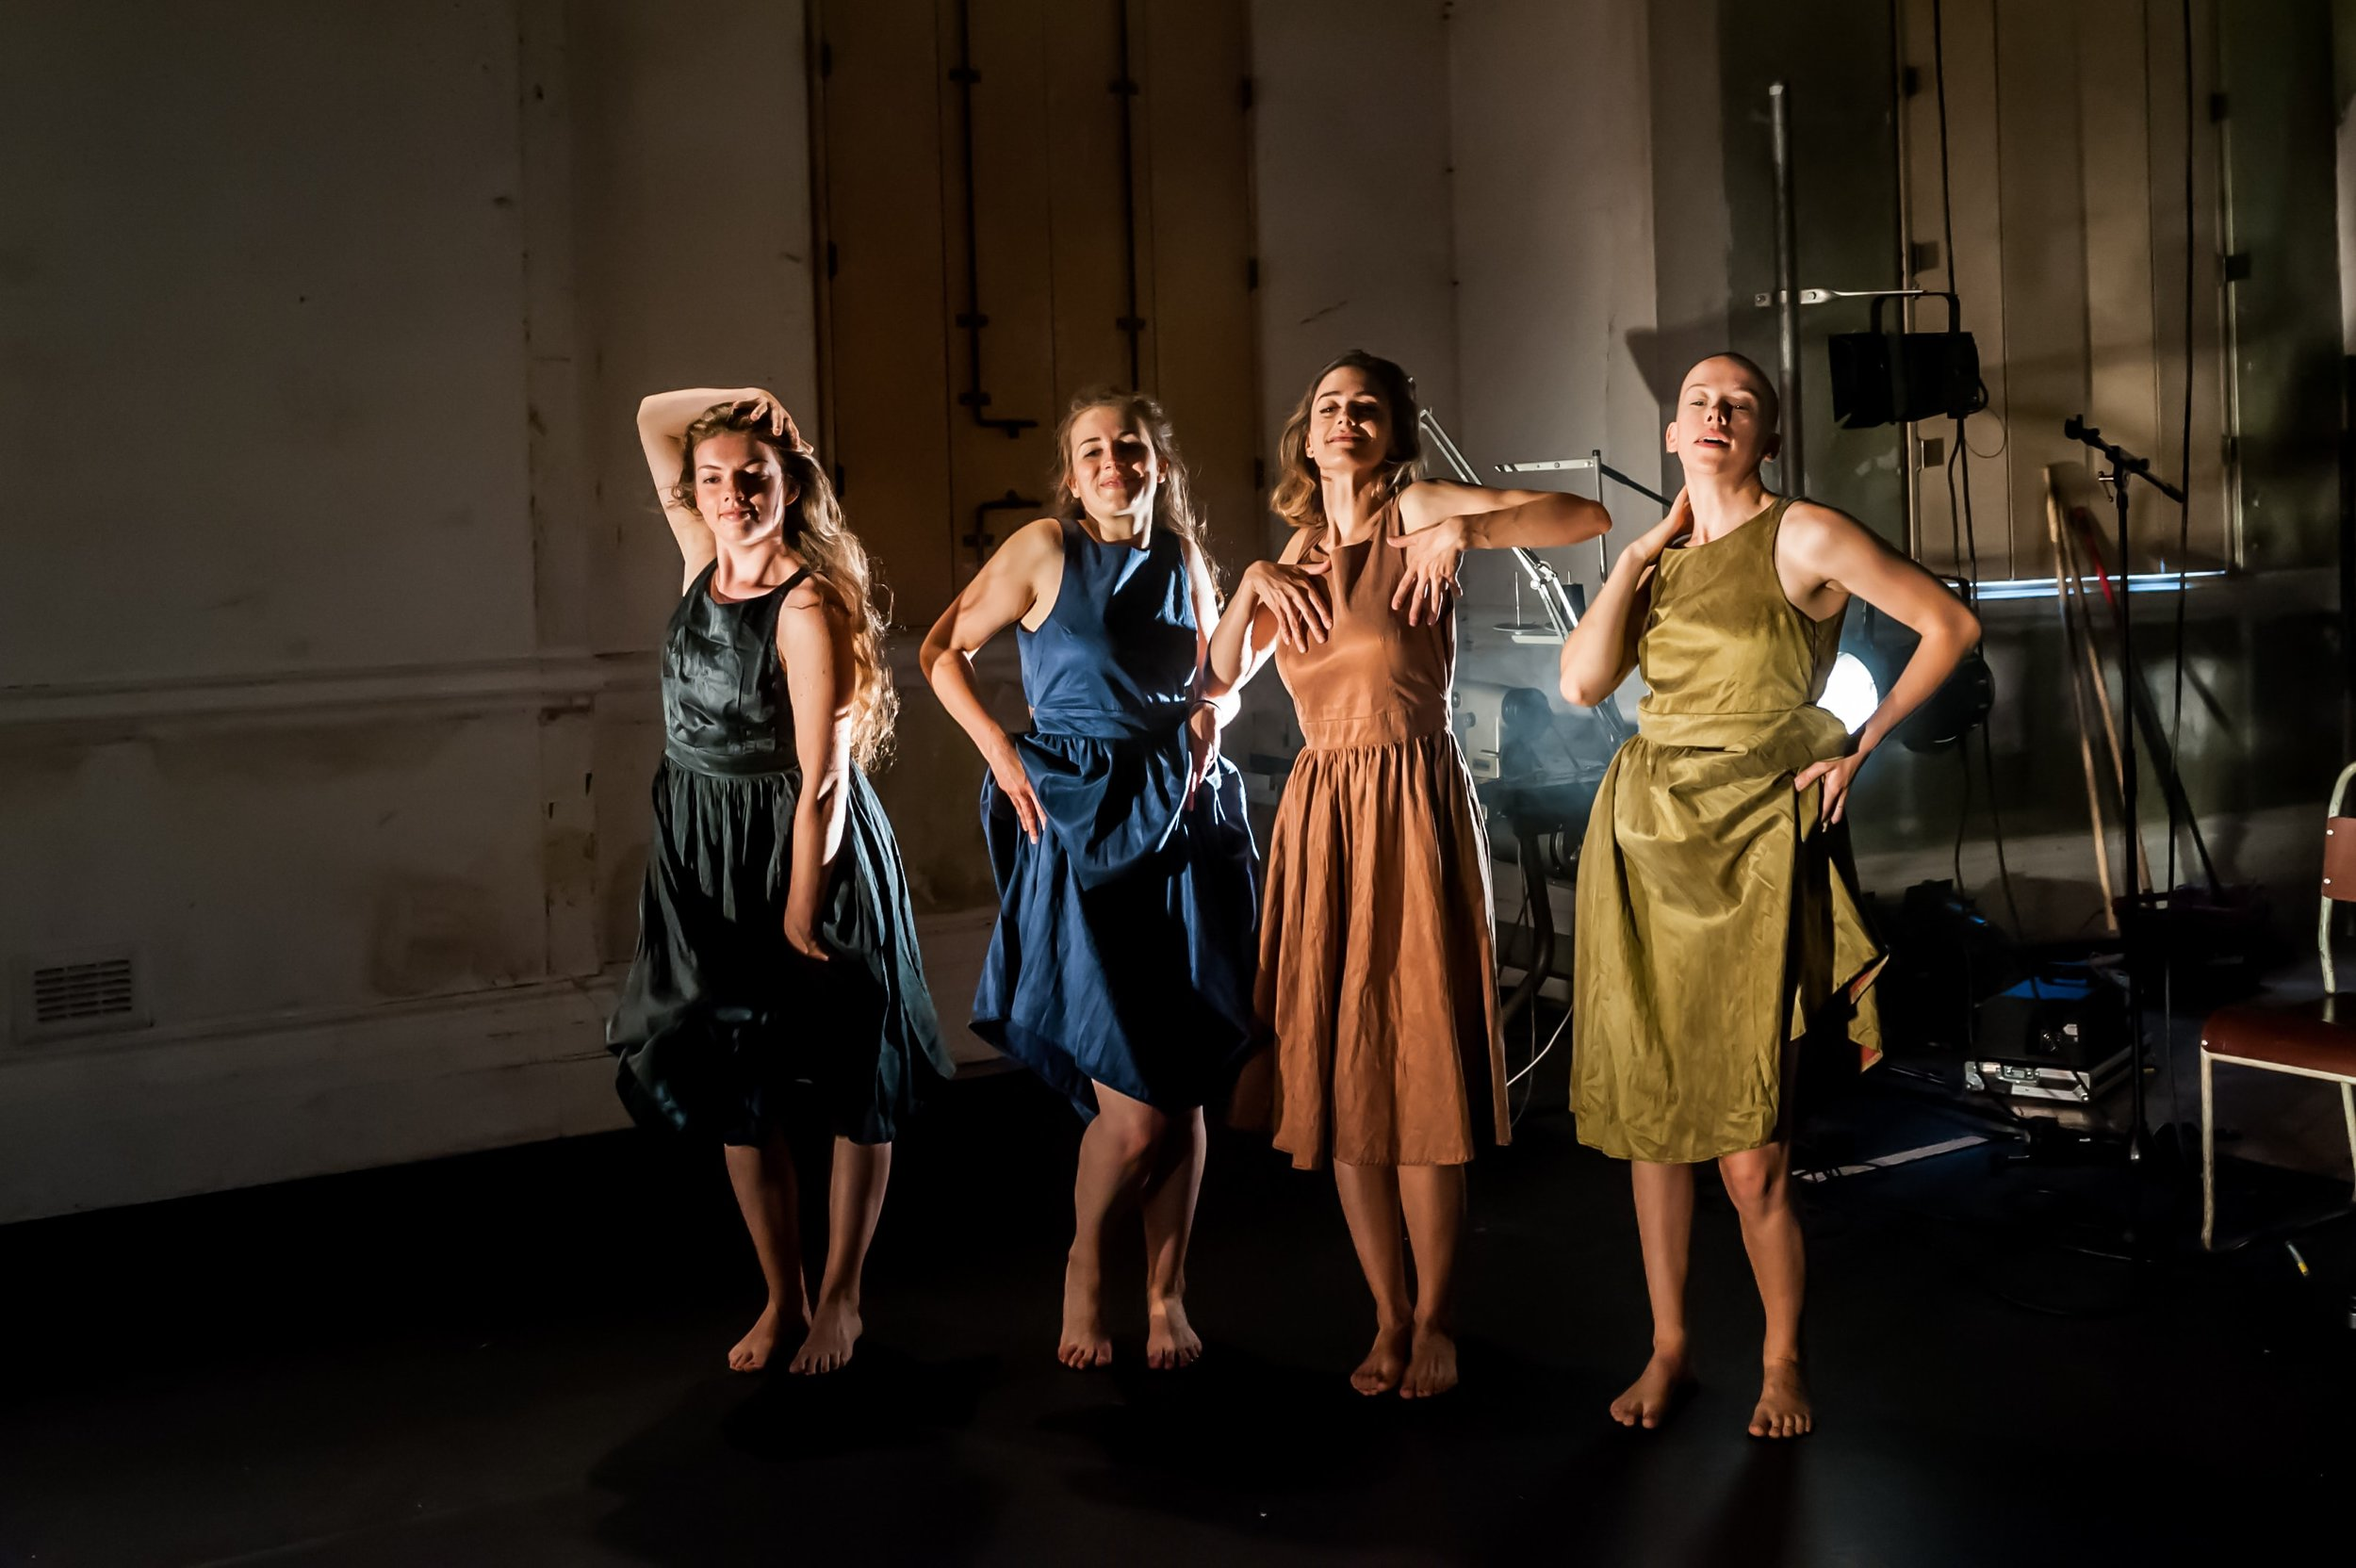 Lydia Higginson, Josie Dale-Jones, Imogen Mahdavi, Olivia Norris (1) in dressed-min.jpg